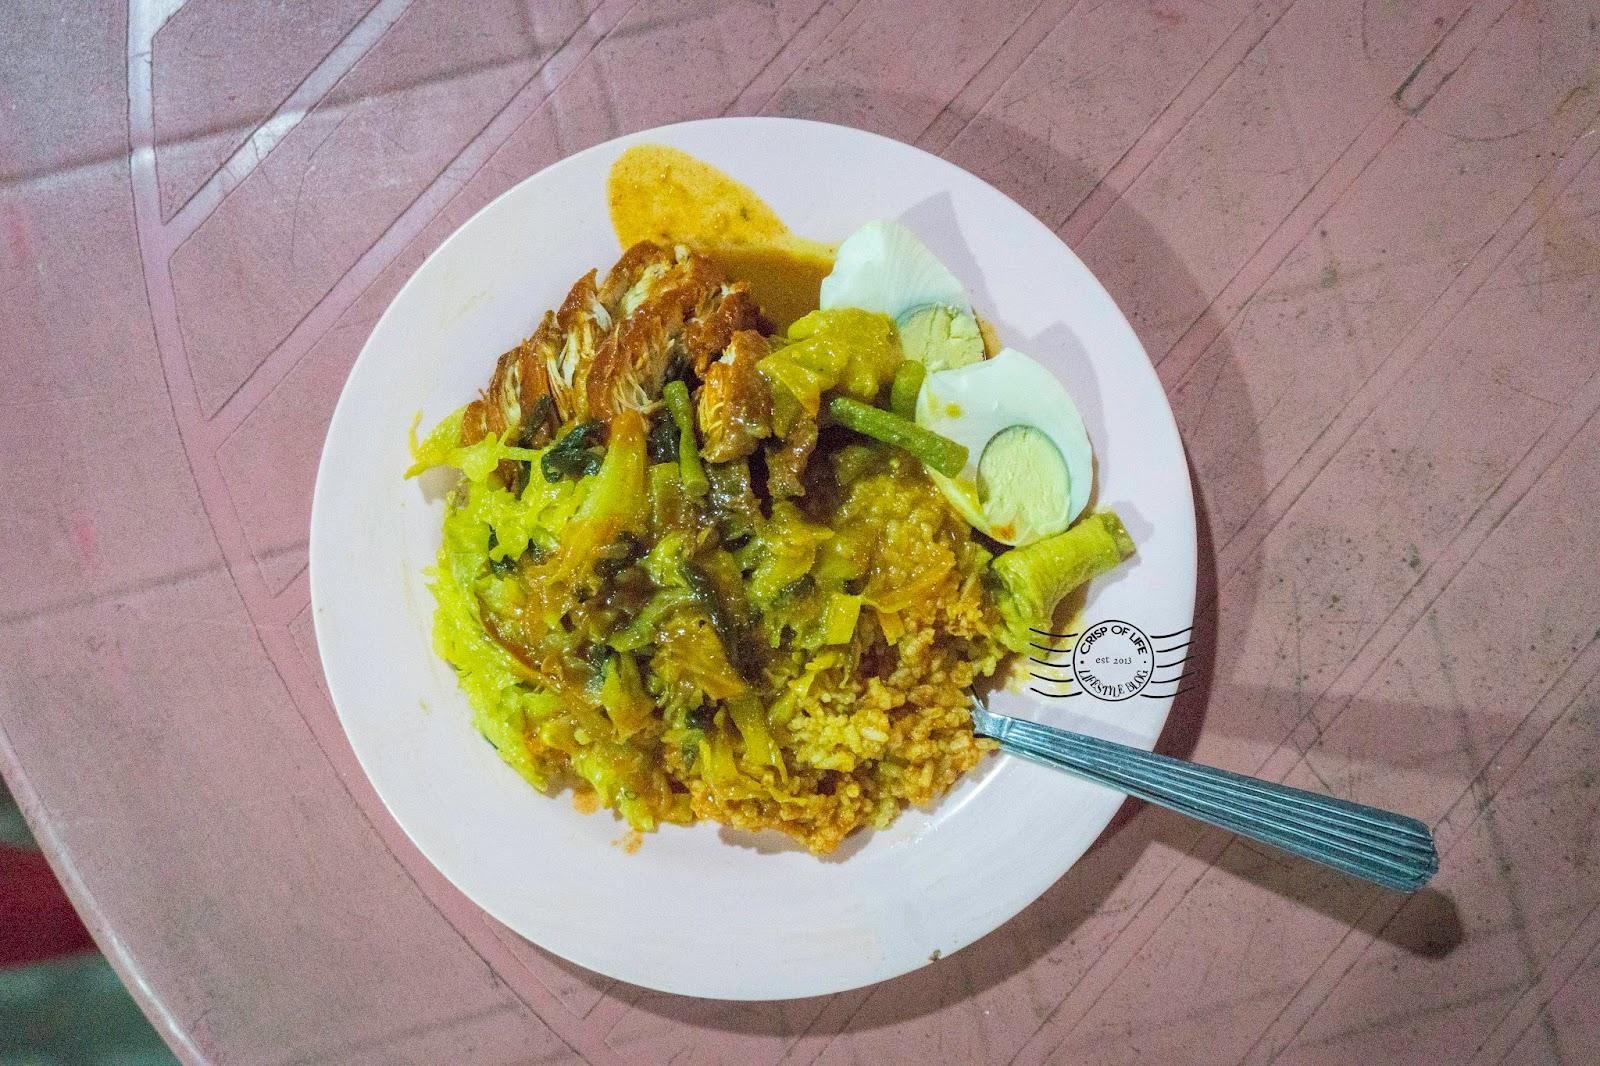 Abang Nasi Tomato Mergong Alor Setar Kedah